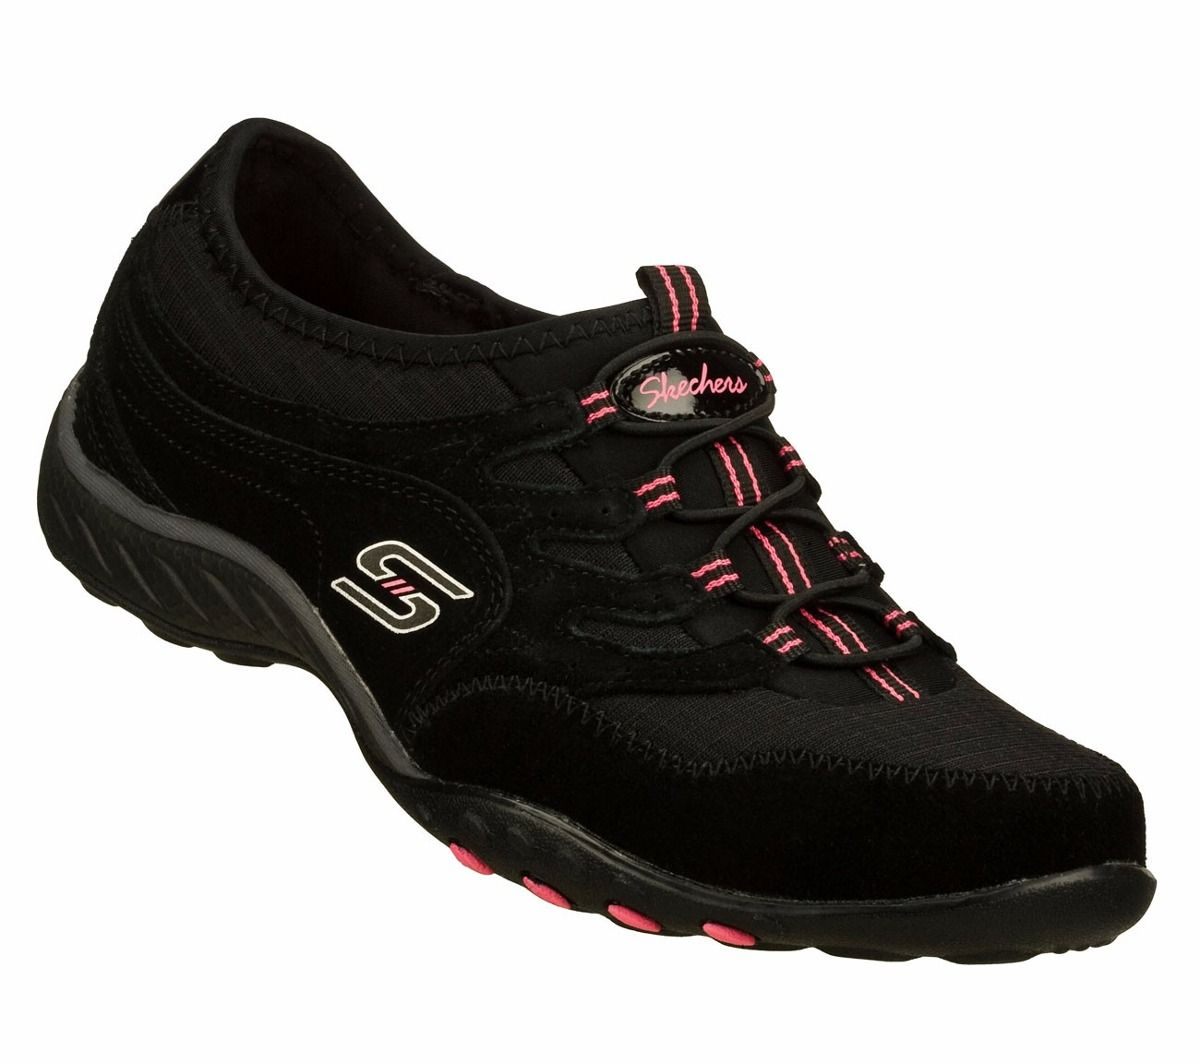 zapatos skechers mujer baratos zaragoza washington